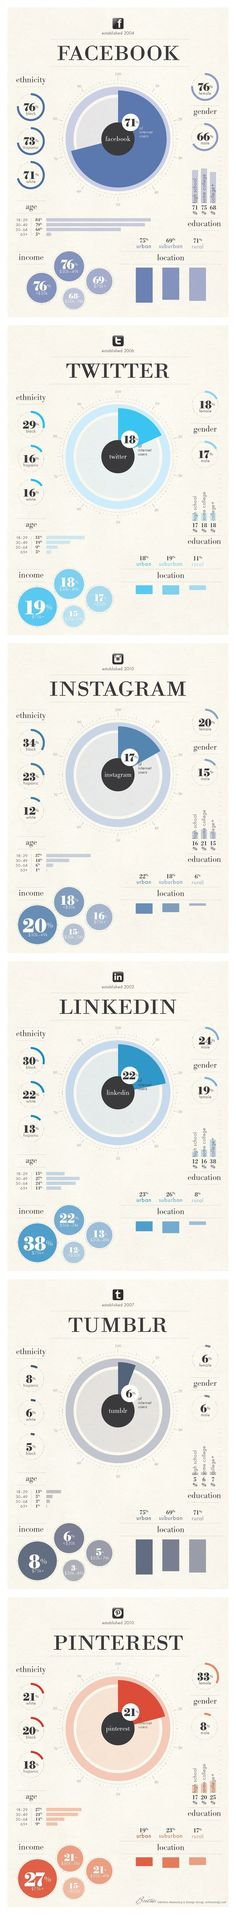 #SocialMedia: User Demographics For #Facebook #Twitter #Instagram #LinkedIn #Tumblr and #Pinterest - #infographic